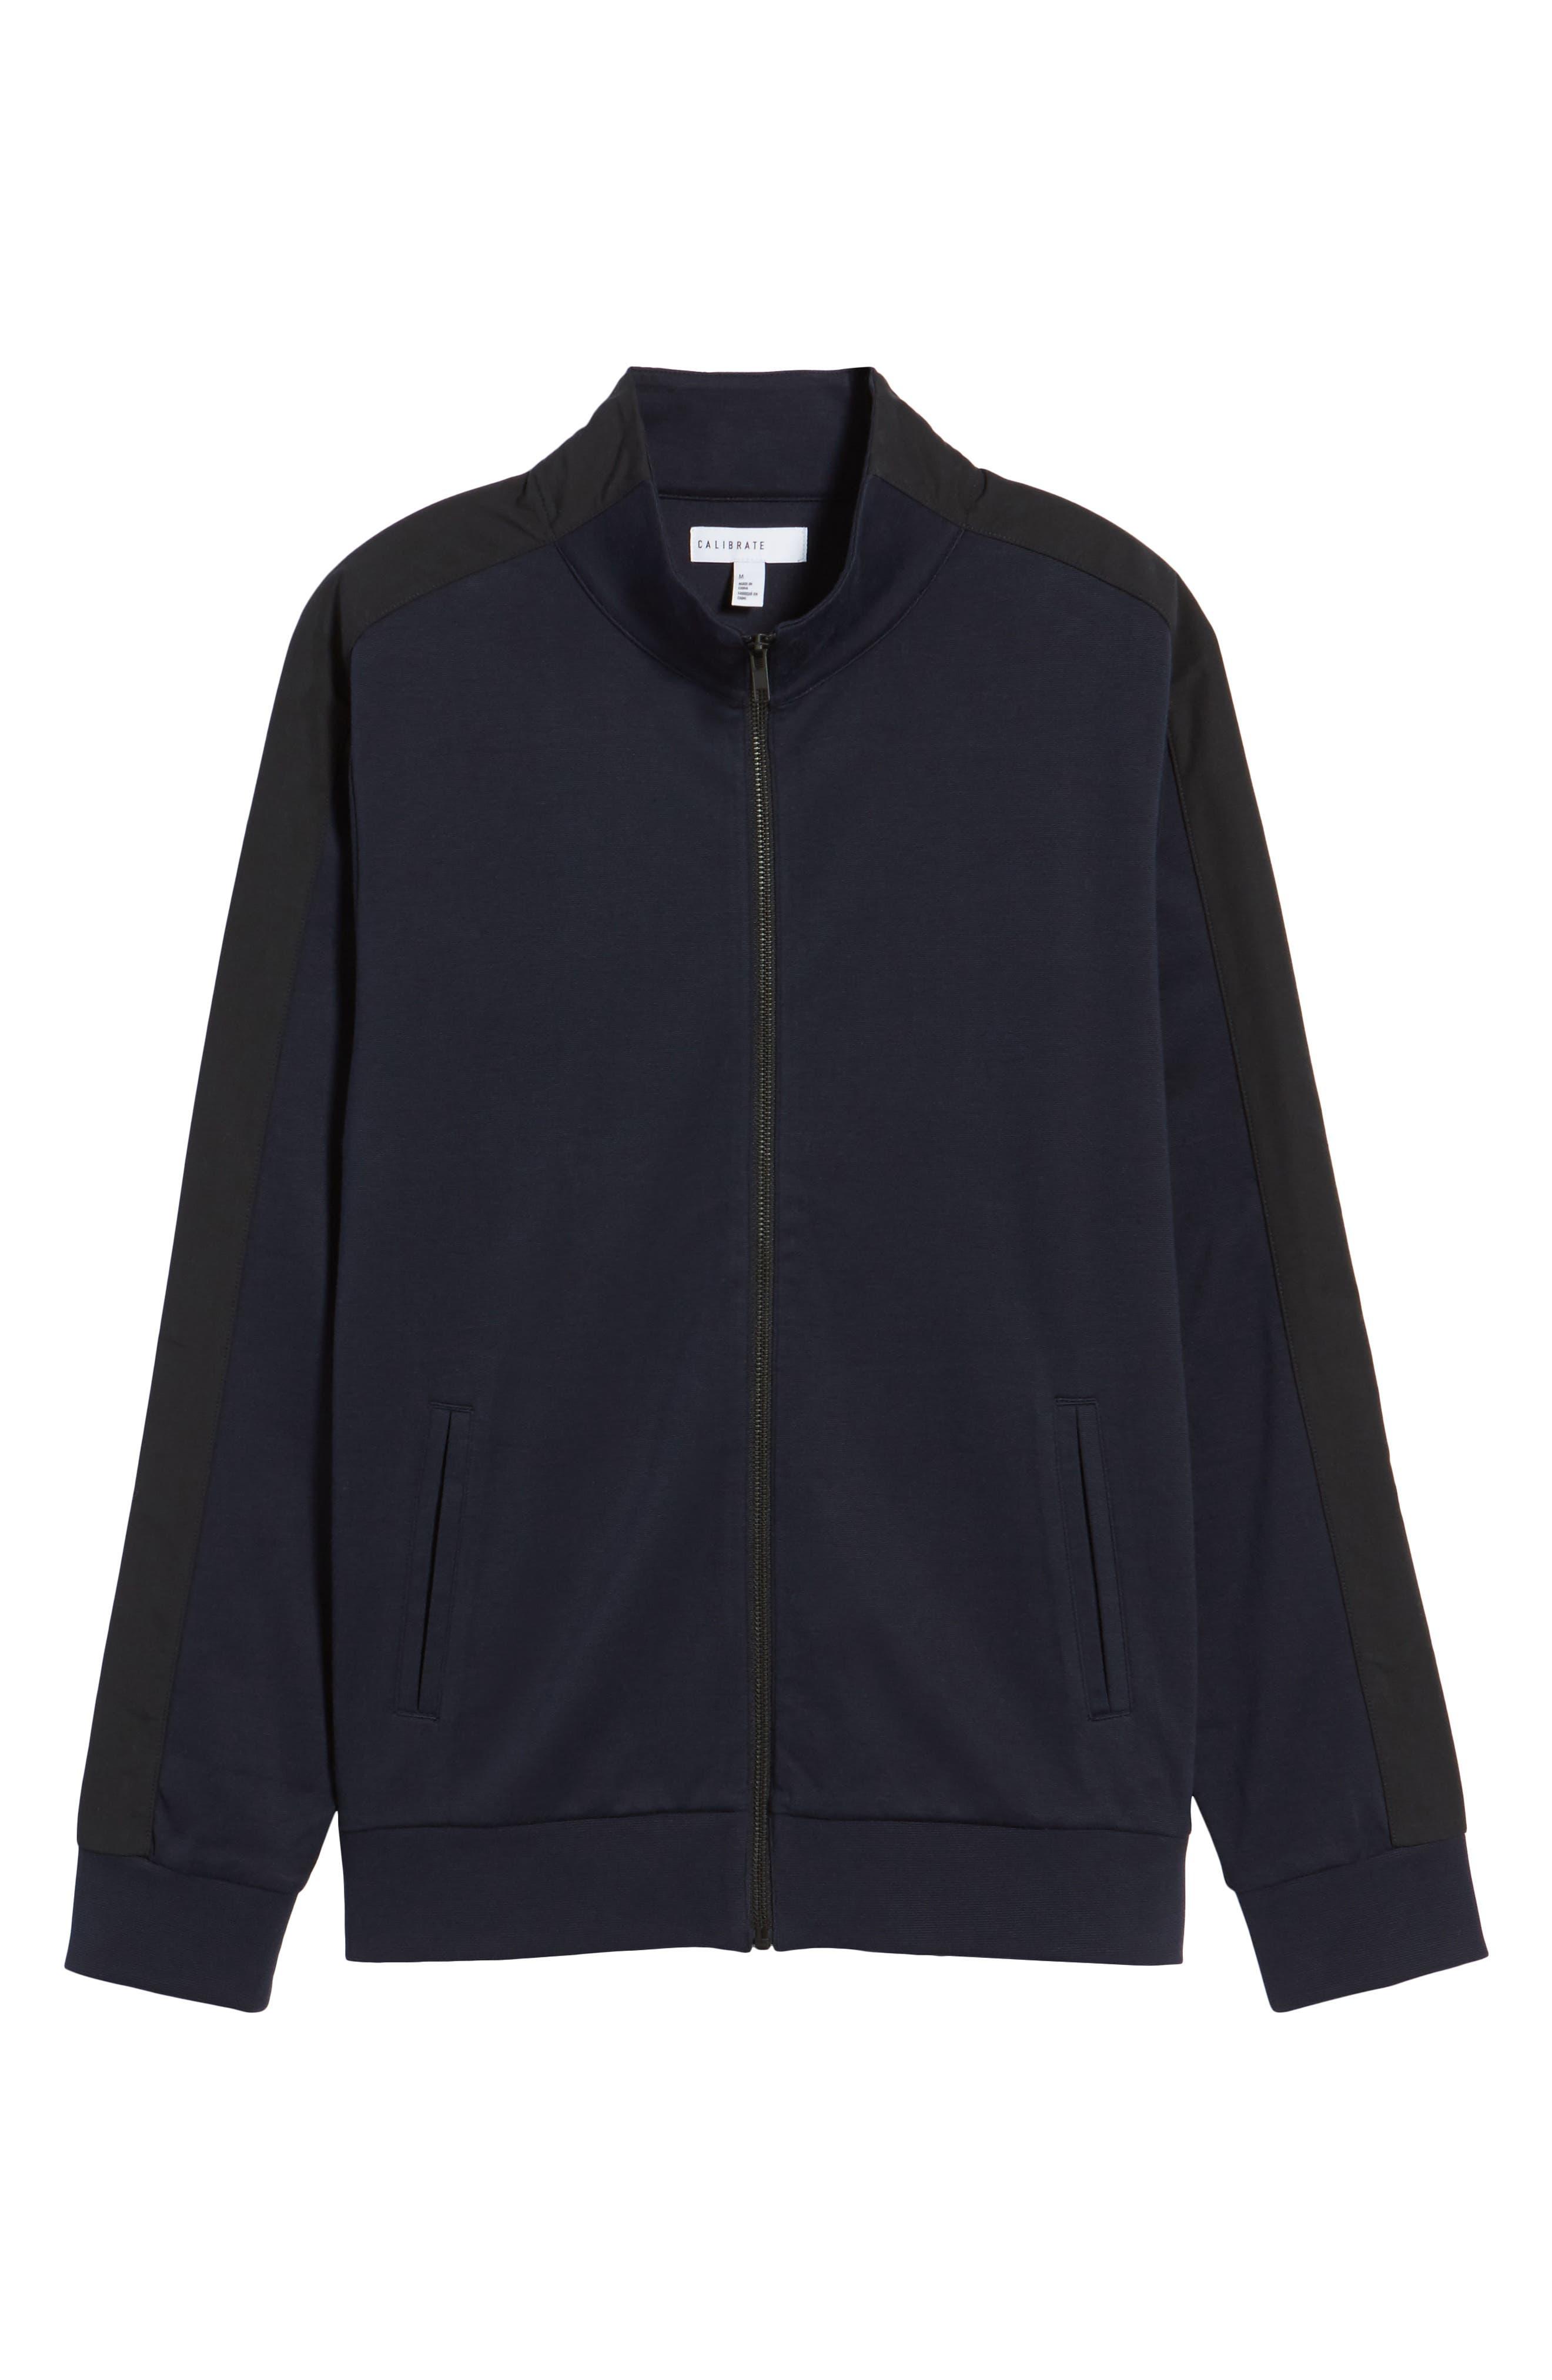 Fleece Jacket,                             Alternate thumbnail 6, color,                             Navy Night Black